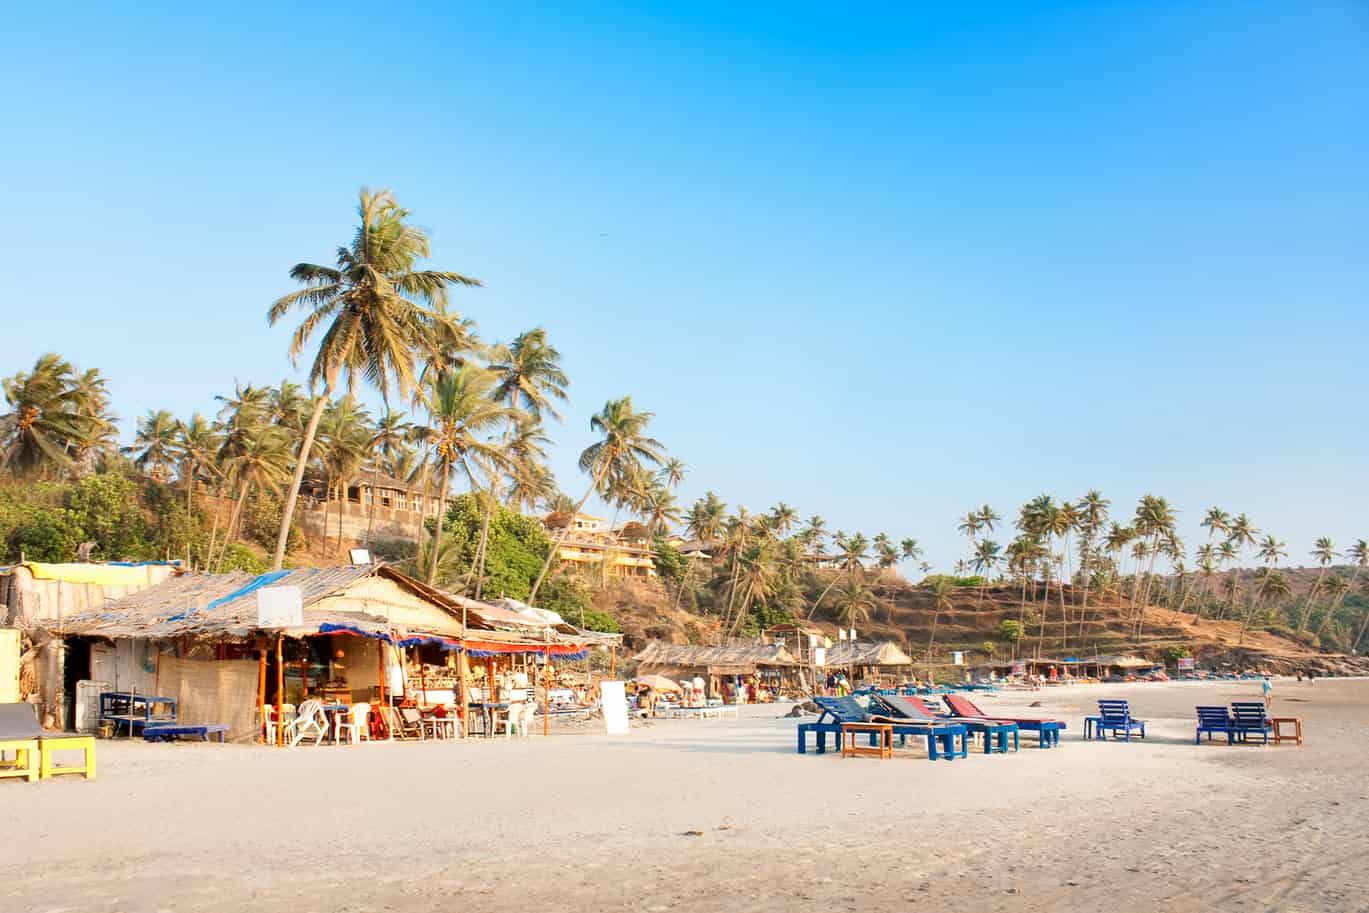 17 Shacks in Goa, Best Beach Shacks in Goa